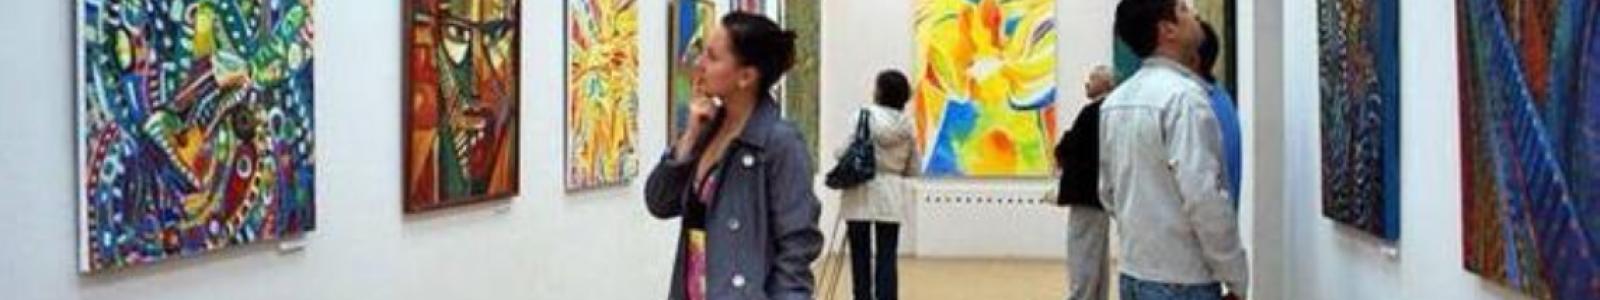 Gallery Painter Mihail Fotiev